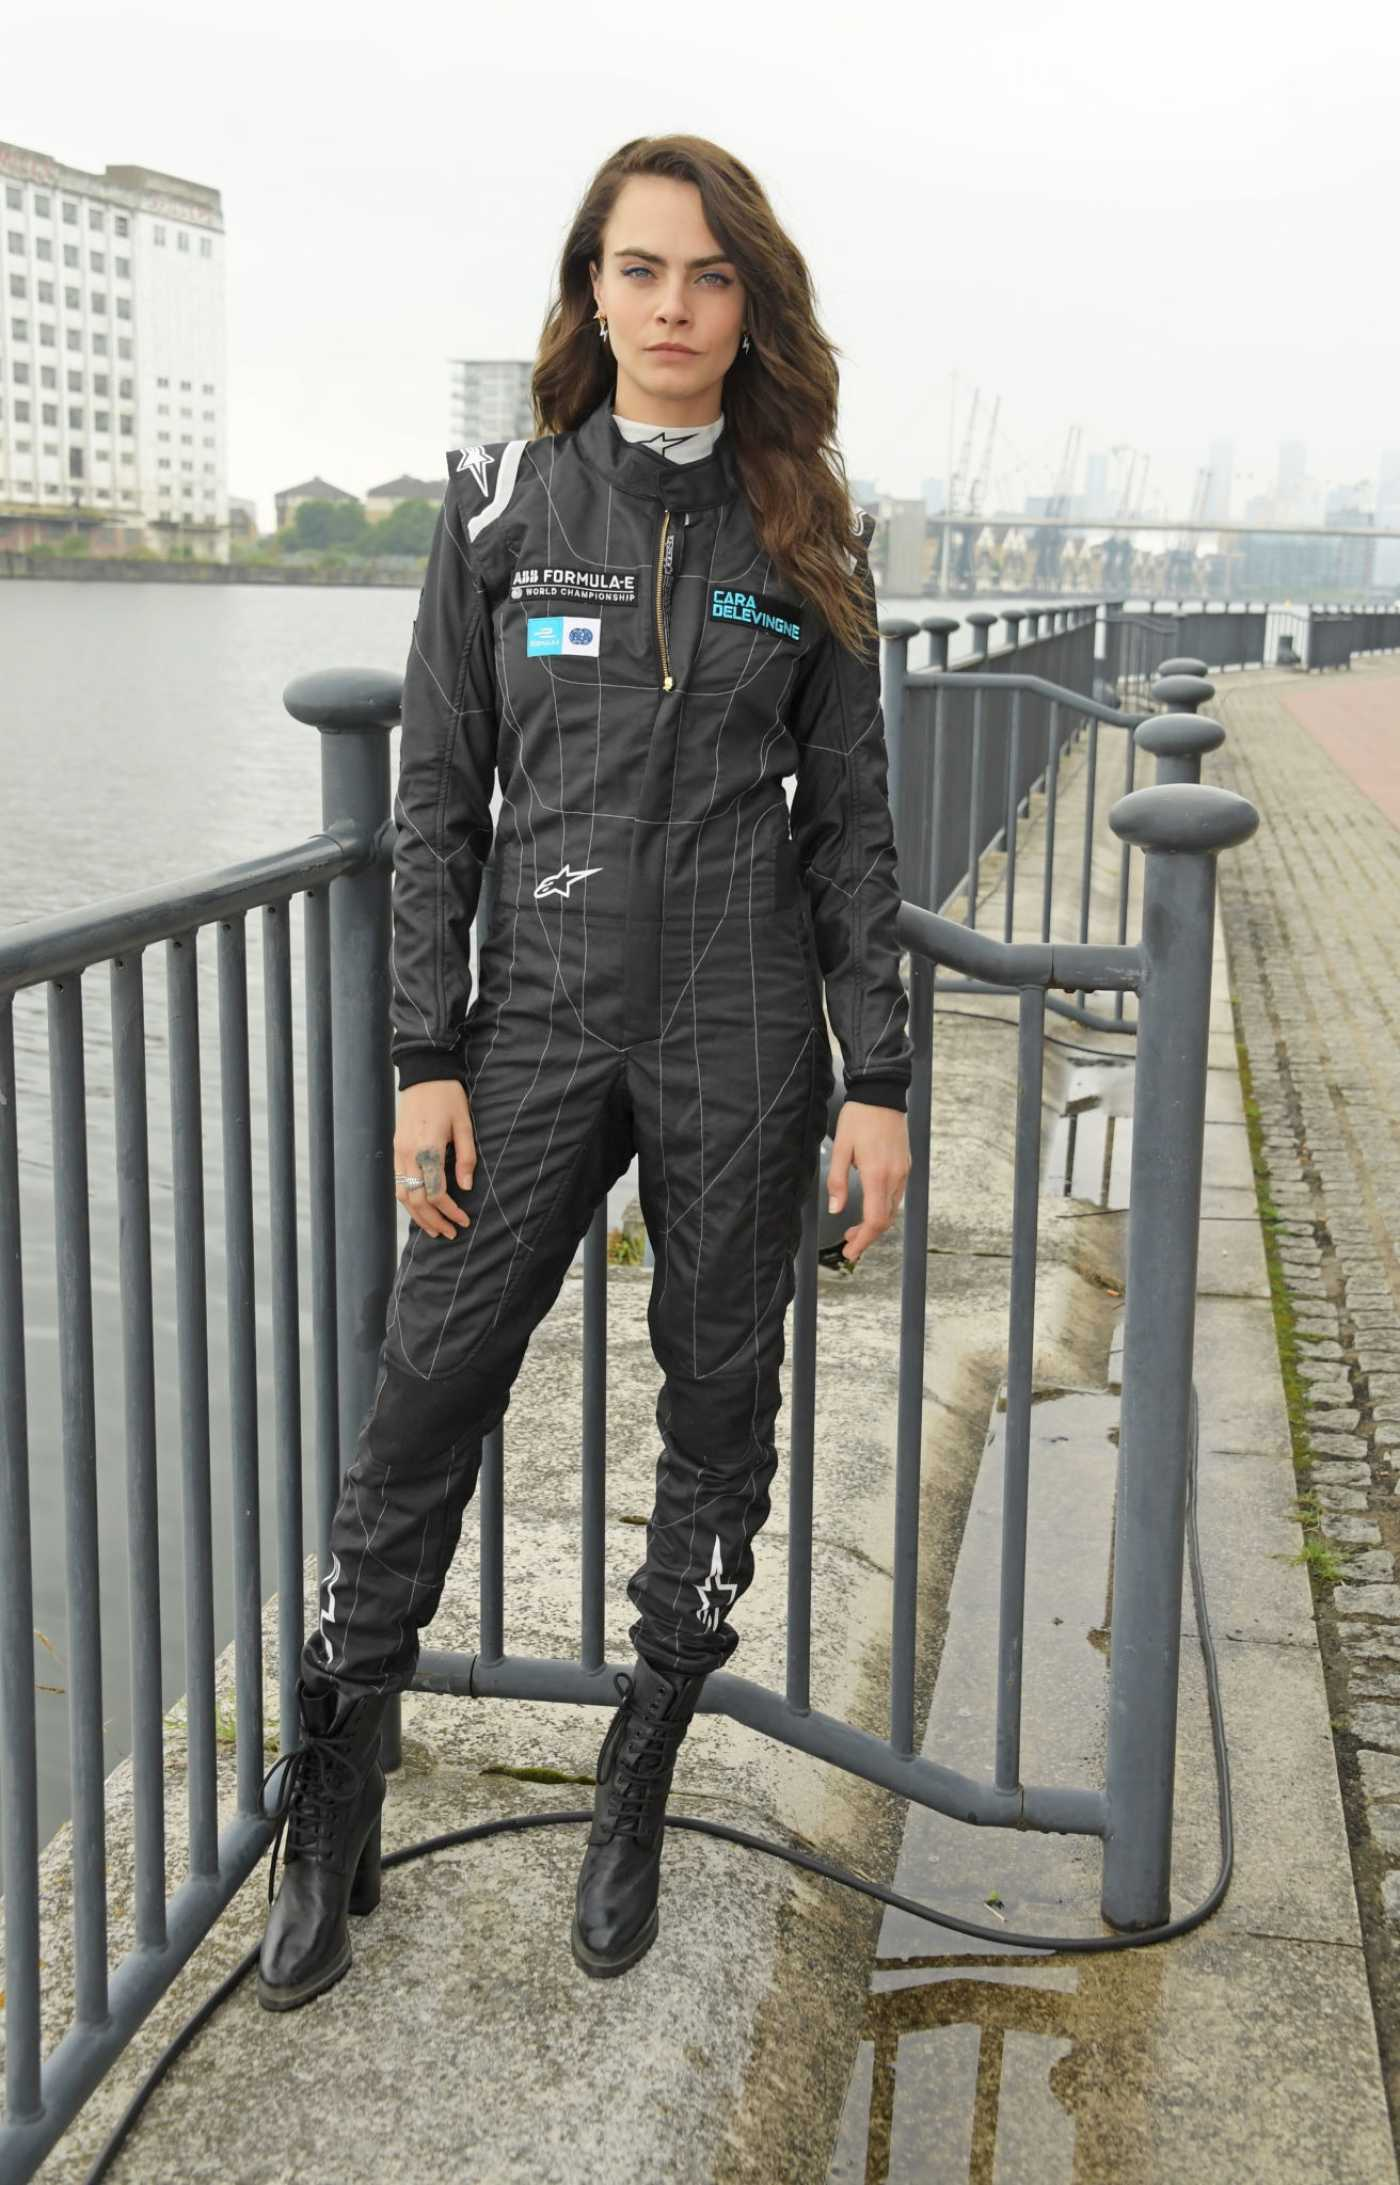 Cara Delevingne in a Black Jumpsuit Attends the ABB FIA Formula E Heineken London E-Prix at ExCel in London 07/24/2021